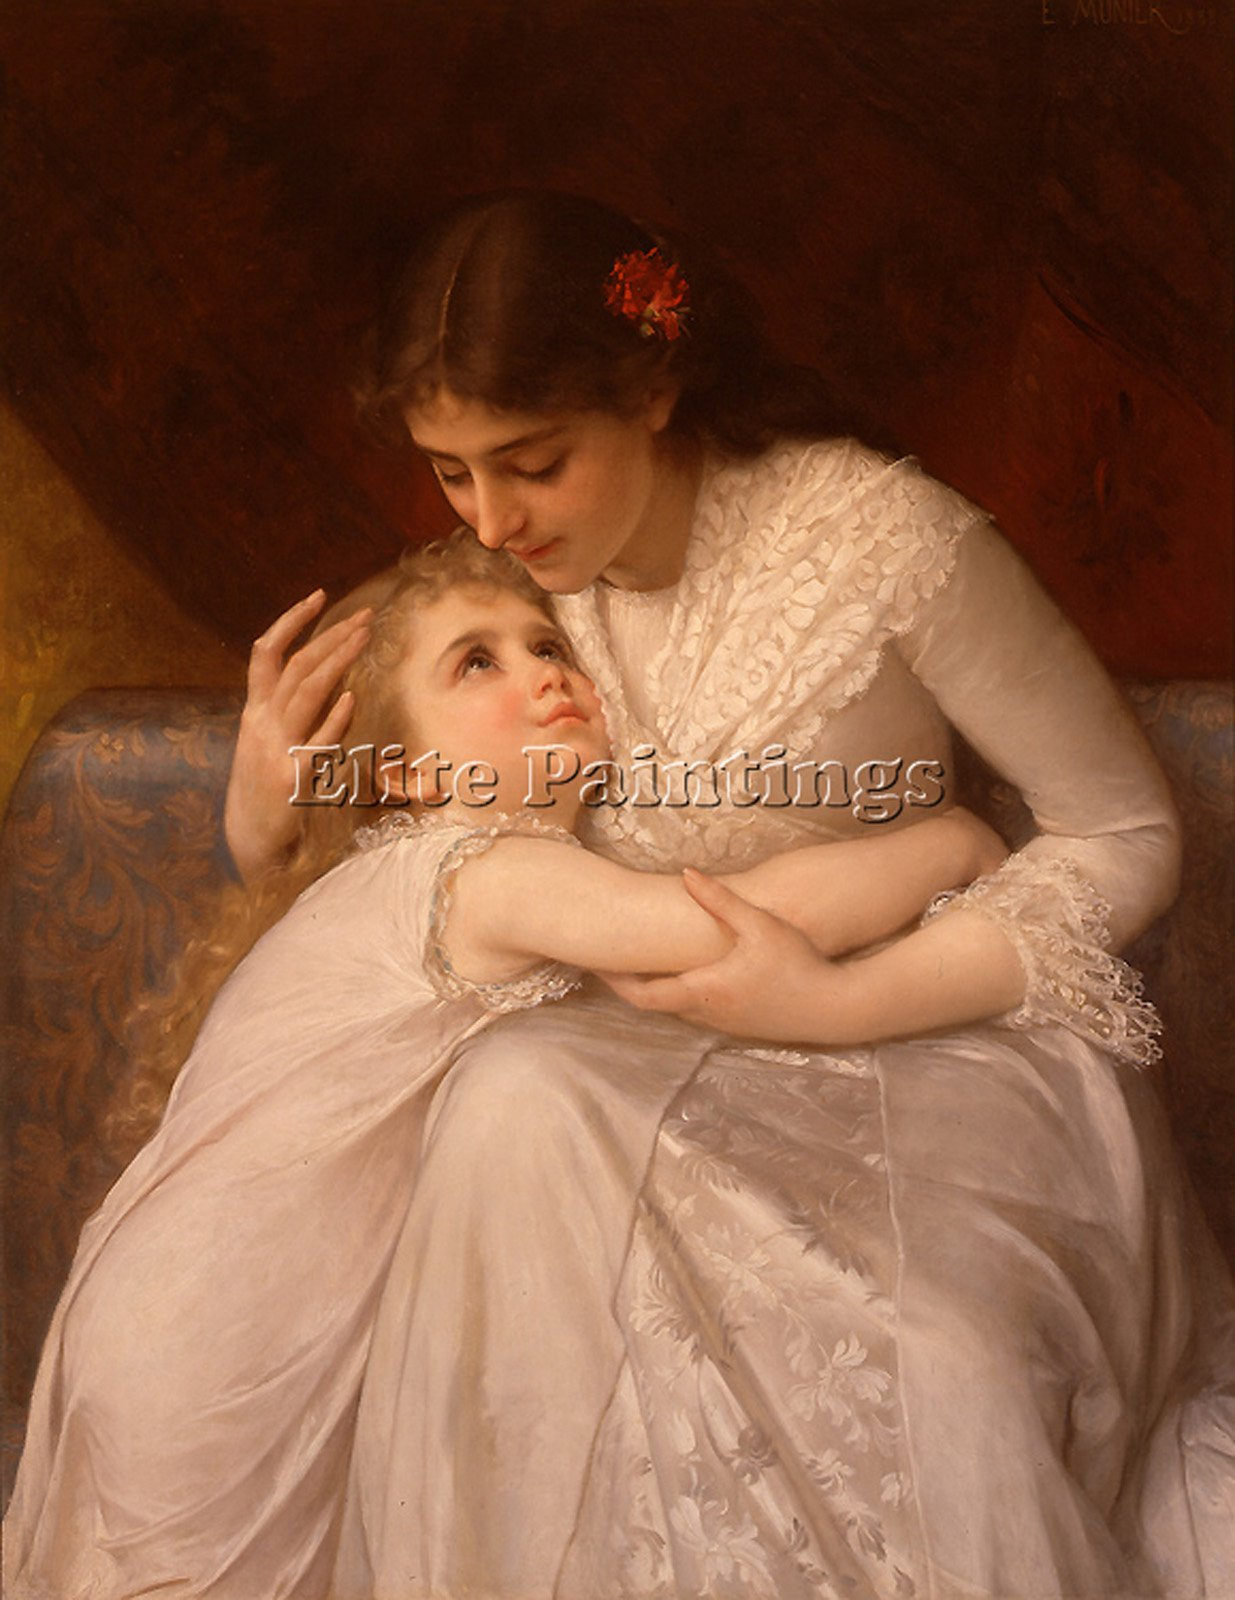 MUNIER 1888 03 PARDON MAMA ARTIST PAINTING HANDMADE OIL CANVAS REPRO ART DECO 32x24inch MUSEUM QUALITY